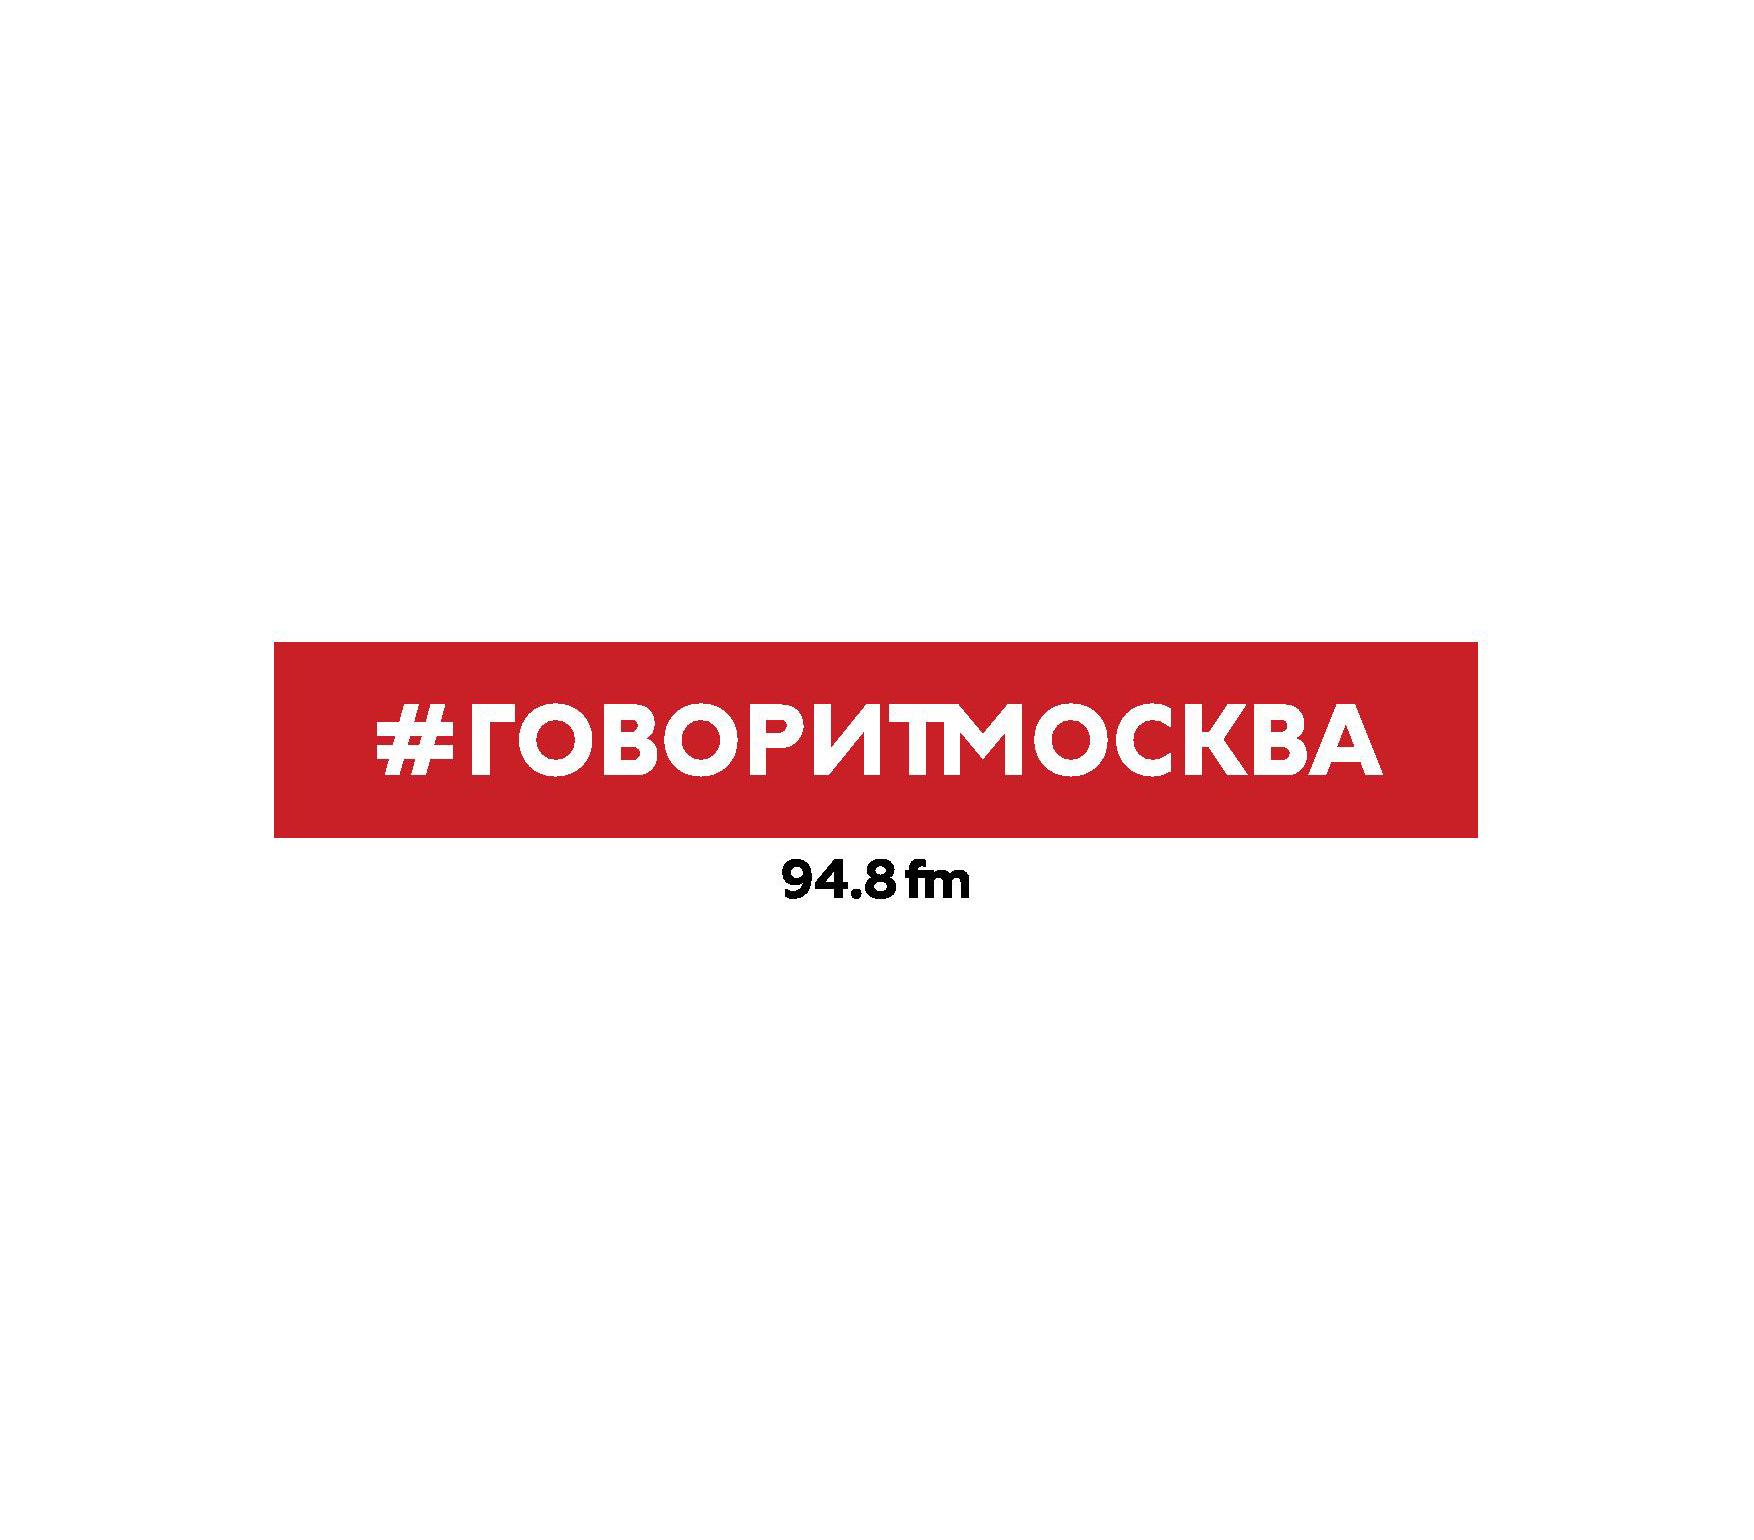 Макс Челноков 8 мая. Константин Хабенский макс челноков 5 мая марат гельман